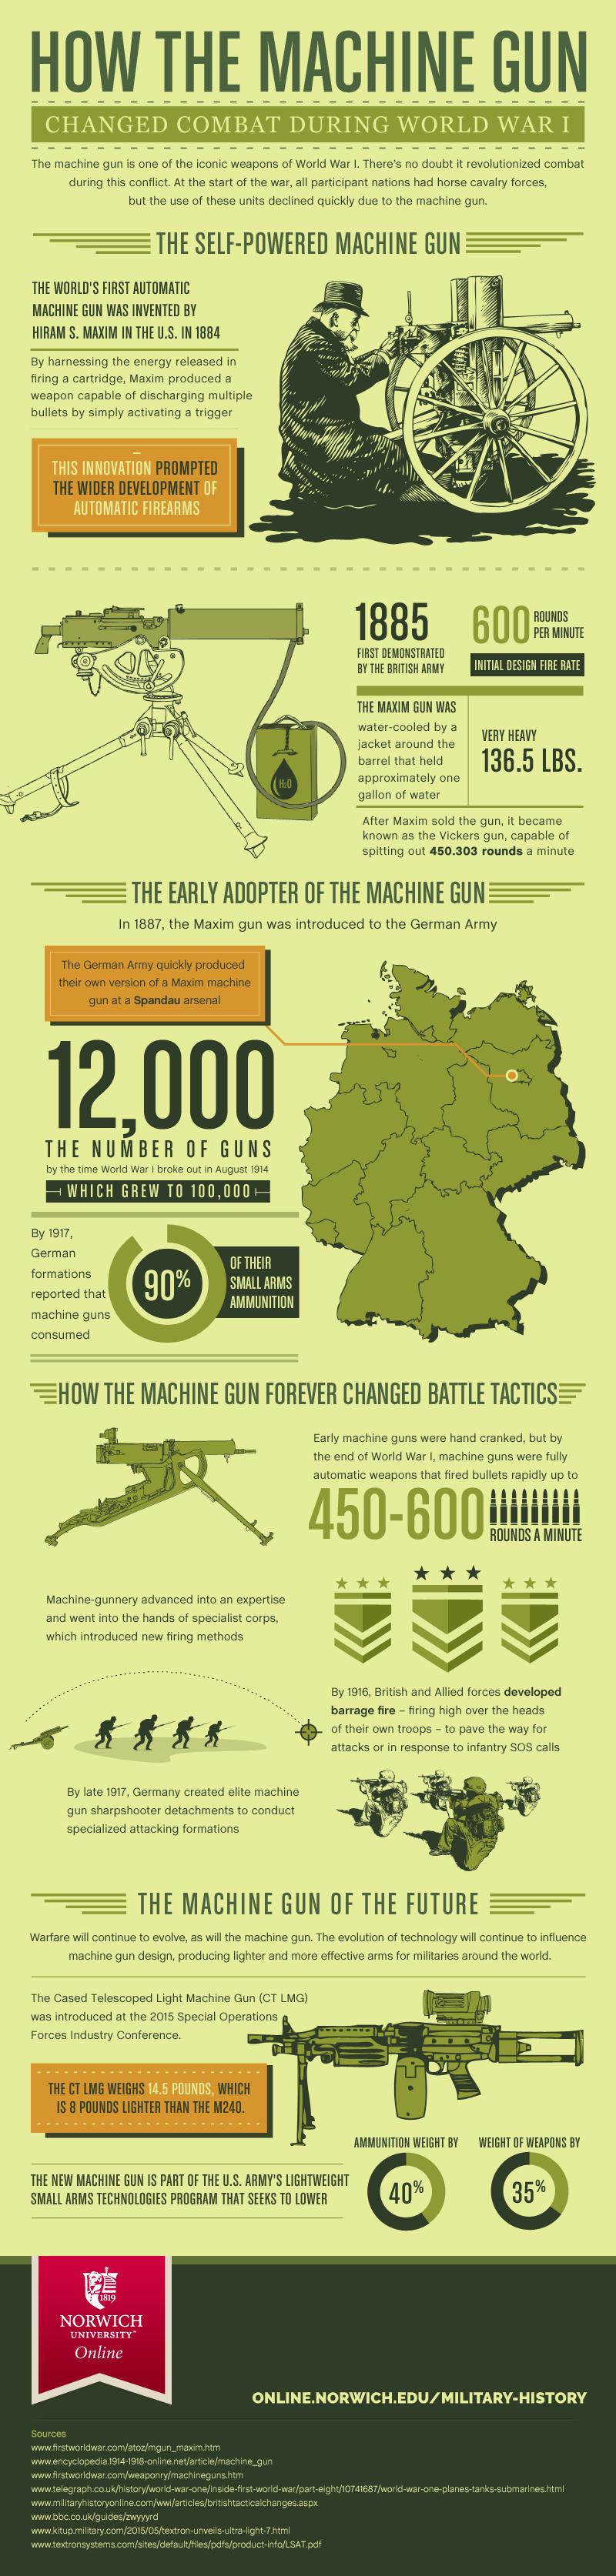 How The Machine Gun Changed Combat During World War 1 #infographic